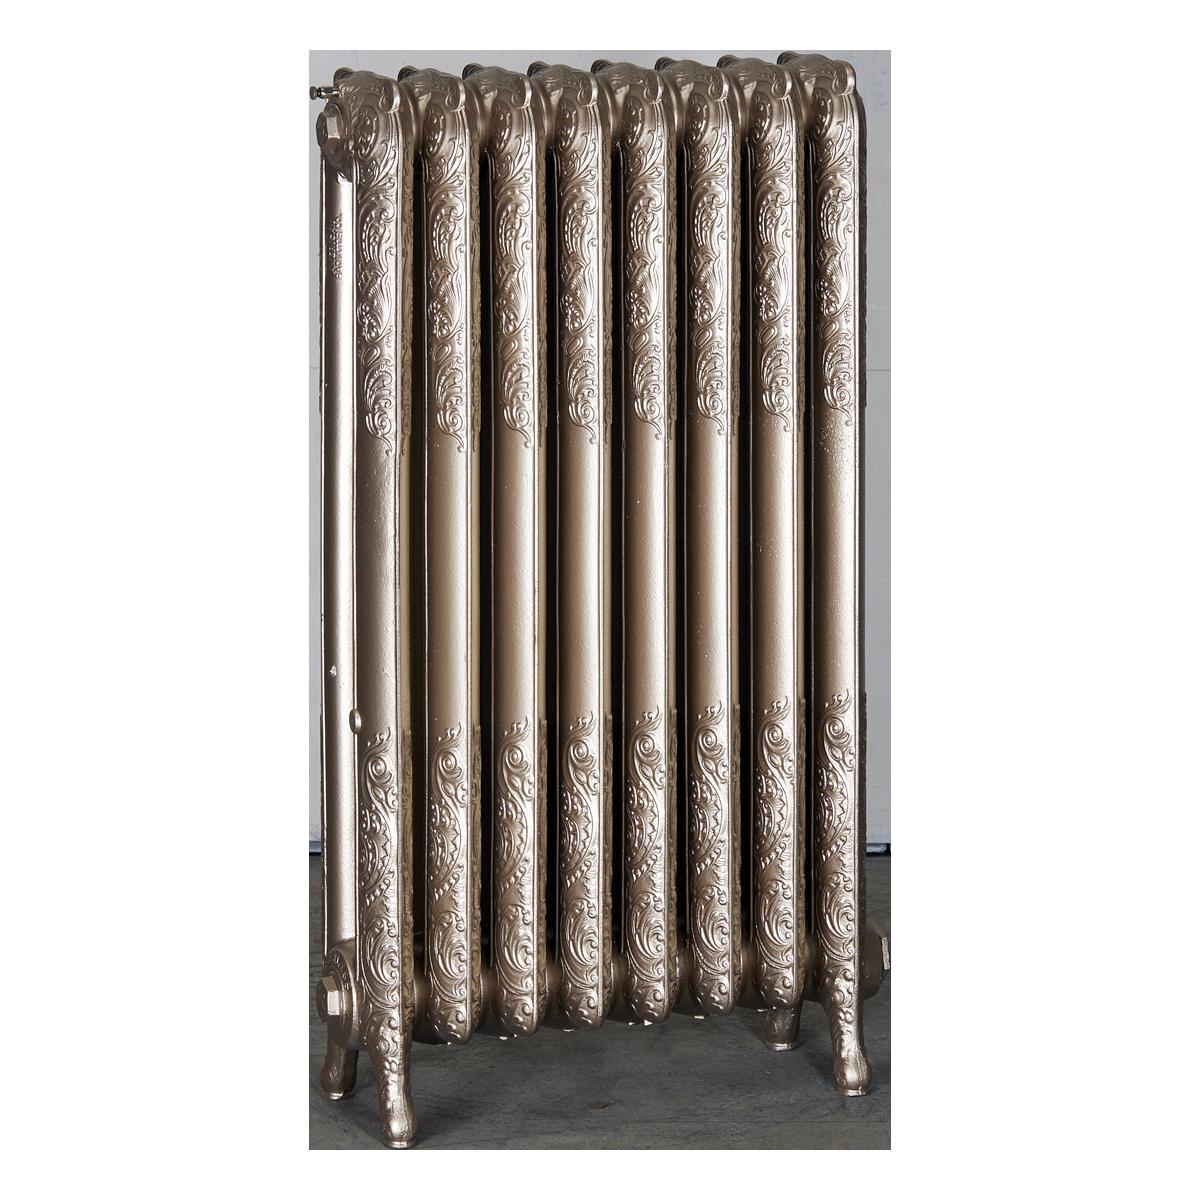 Ironworks Radiators Inc. refurbished cast iron radiator Harbord in Warm Silver metallic